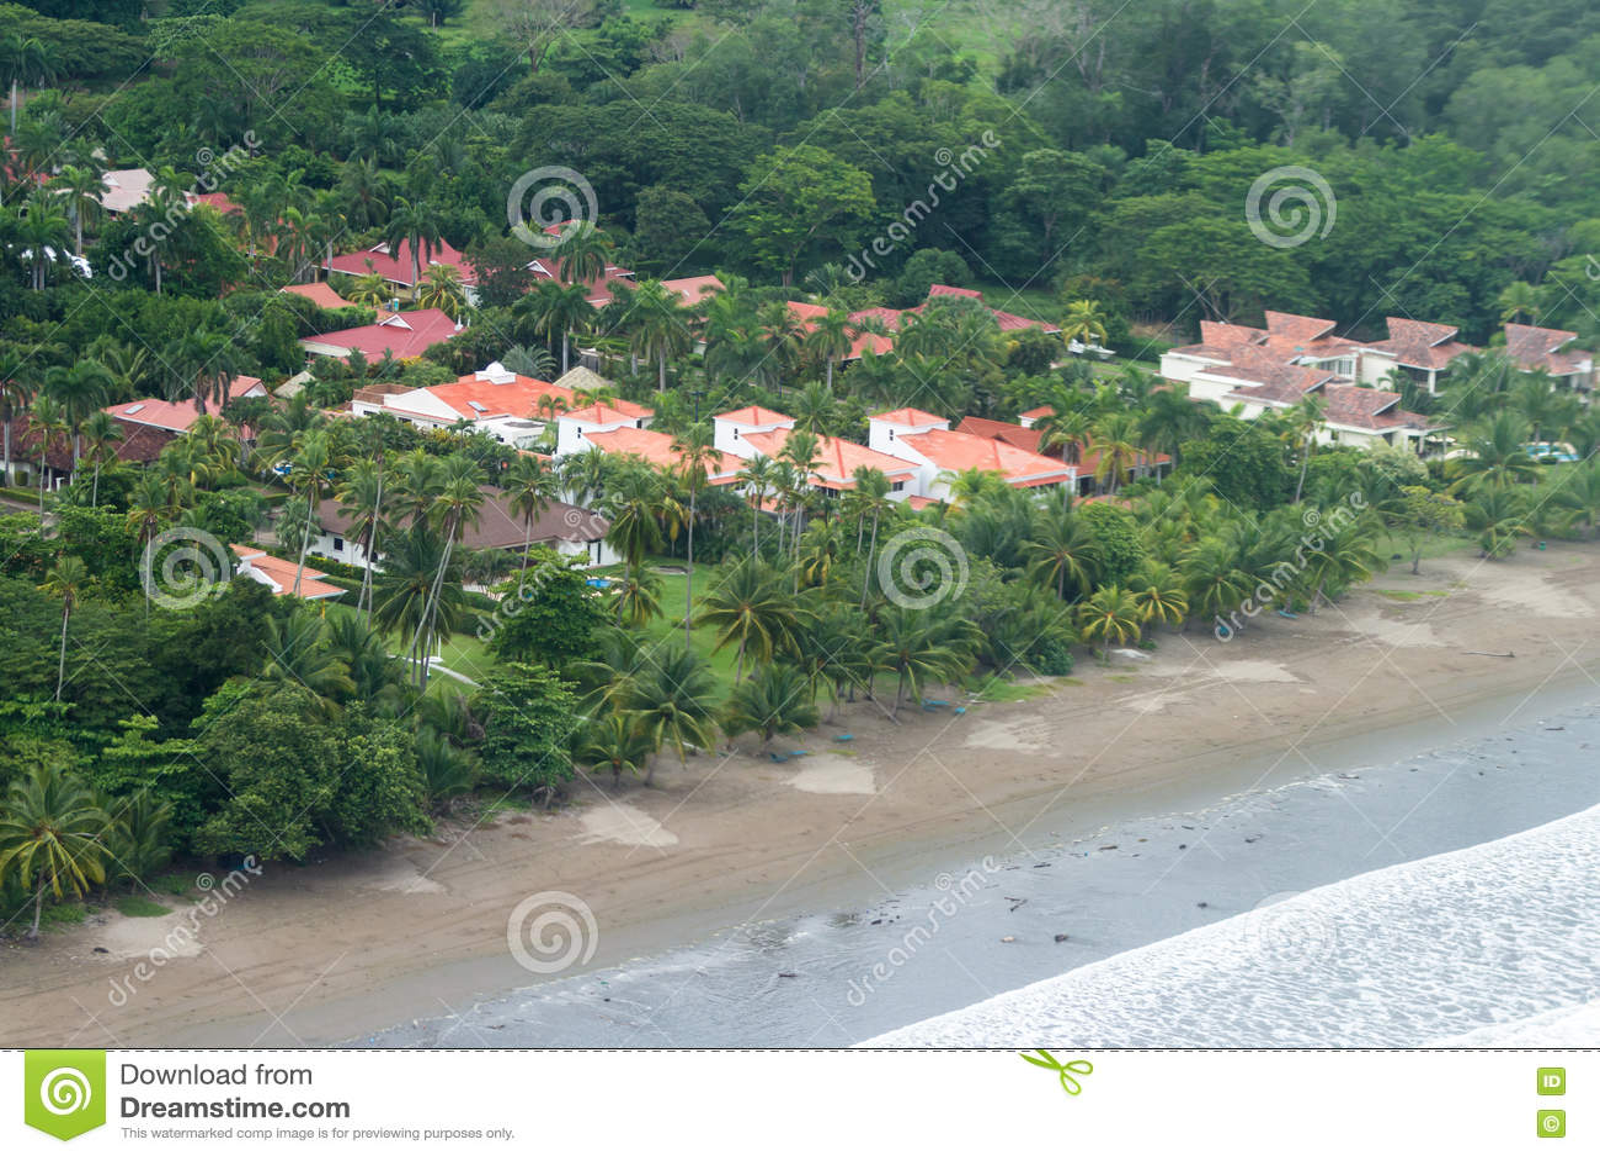 Luxury Beach Homes Royalty Free Stock Image